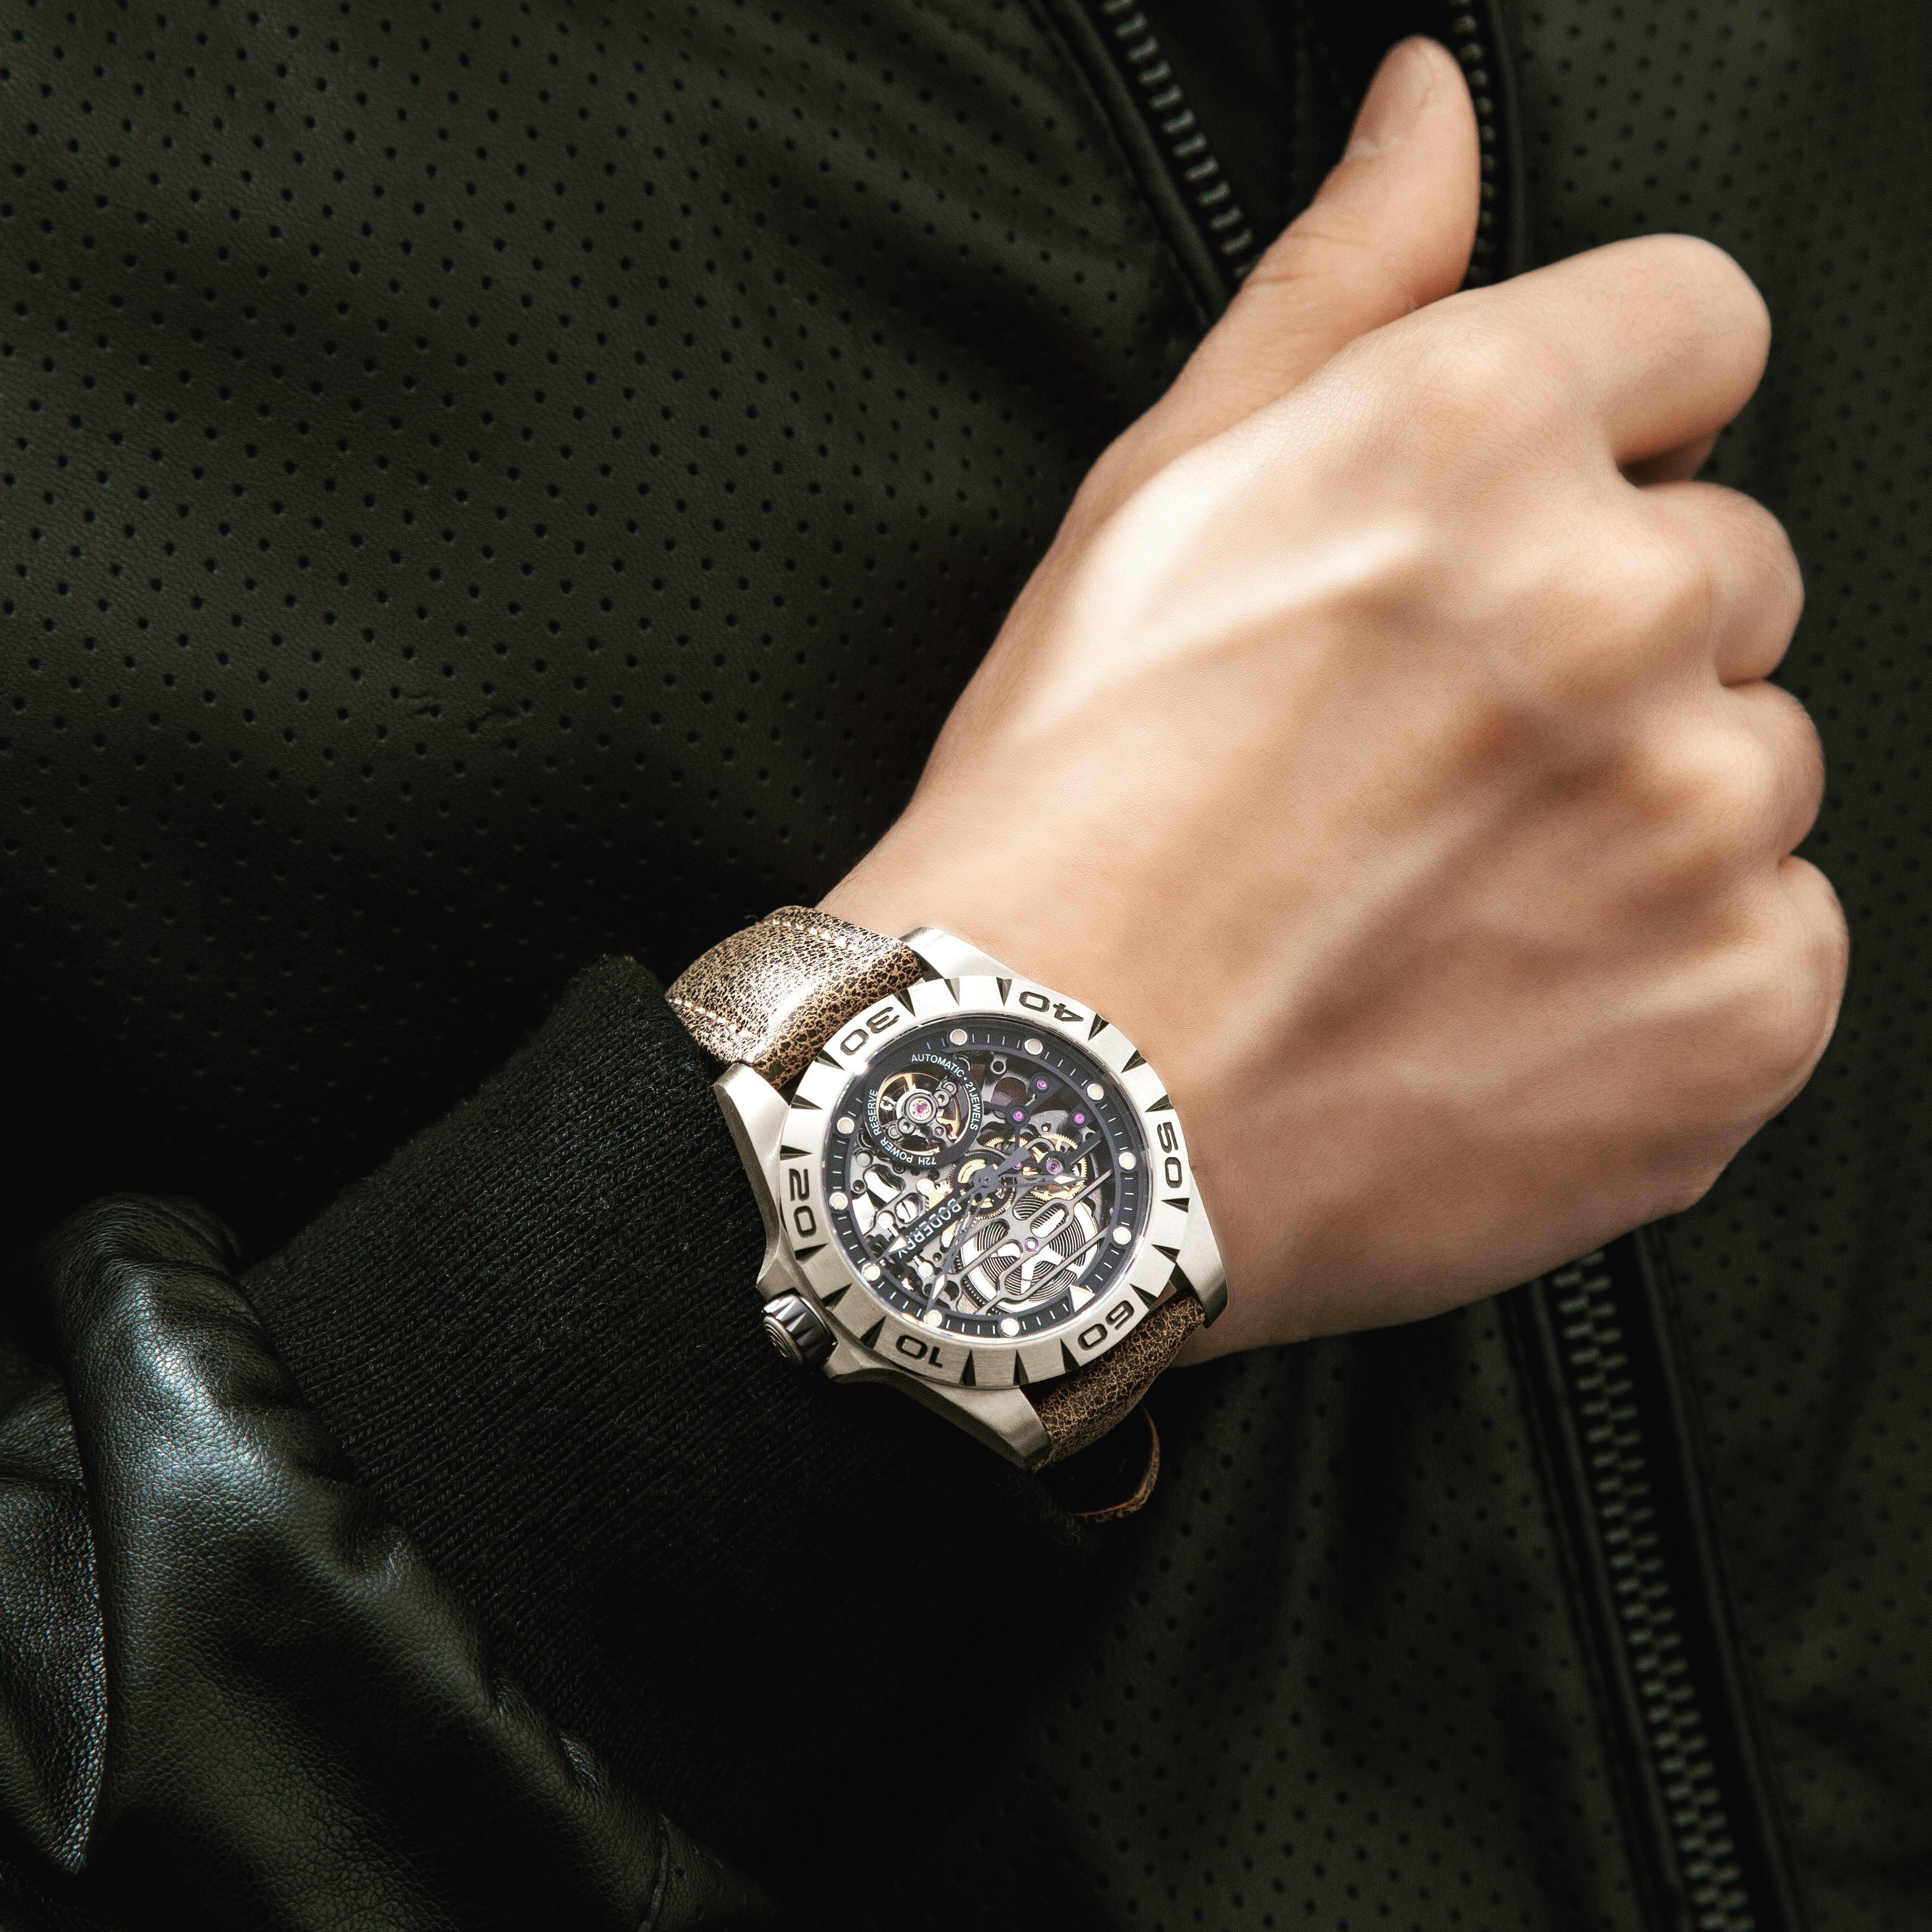 Titanium Case 2020 Top Brand Luxury Men's Watches Skeleton Automatic Mechanical Watch For Men Waterproof Relogio Masculino